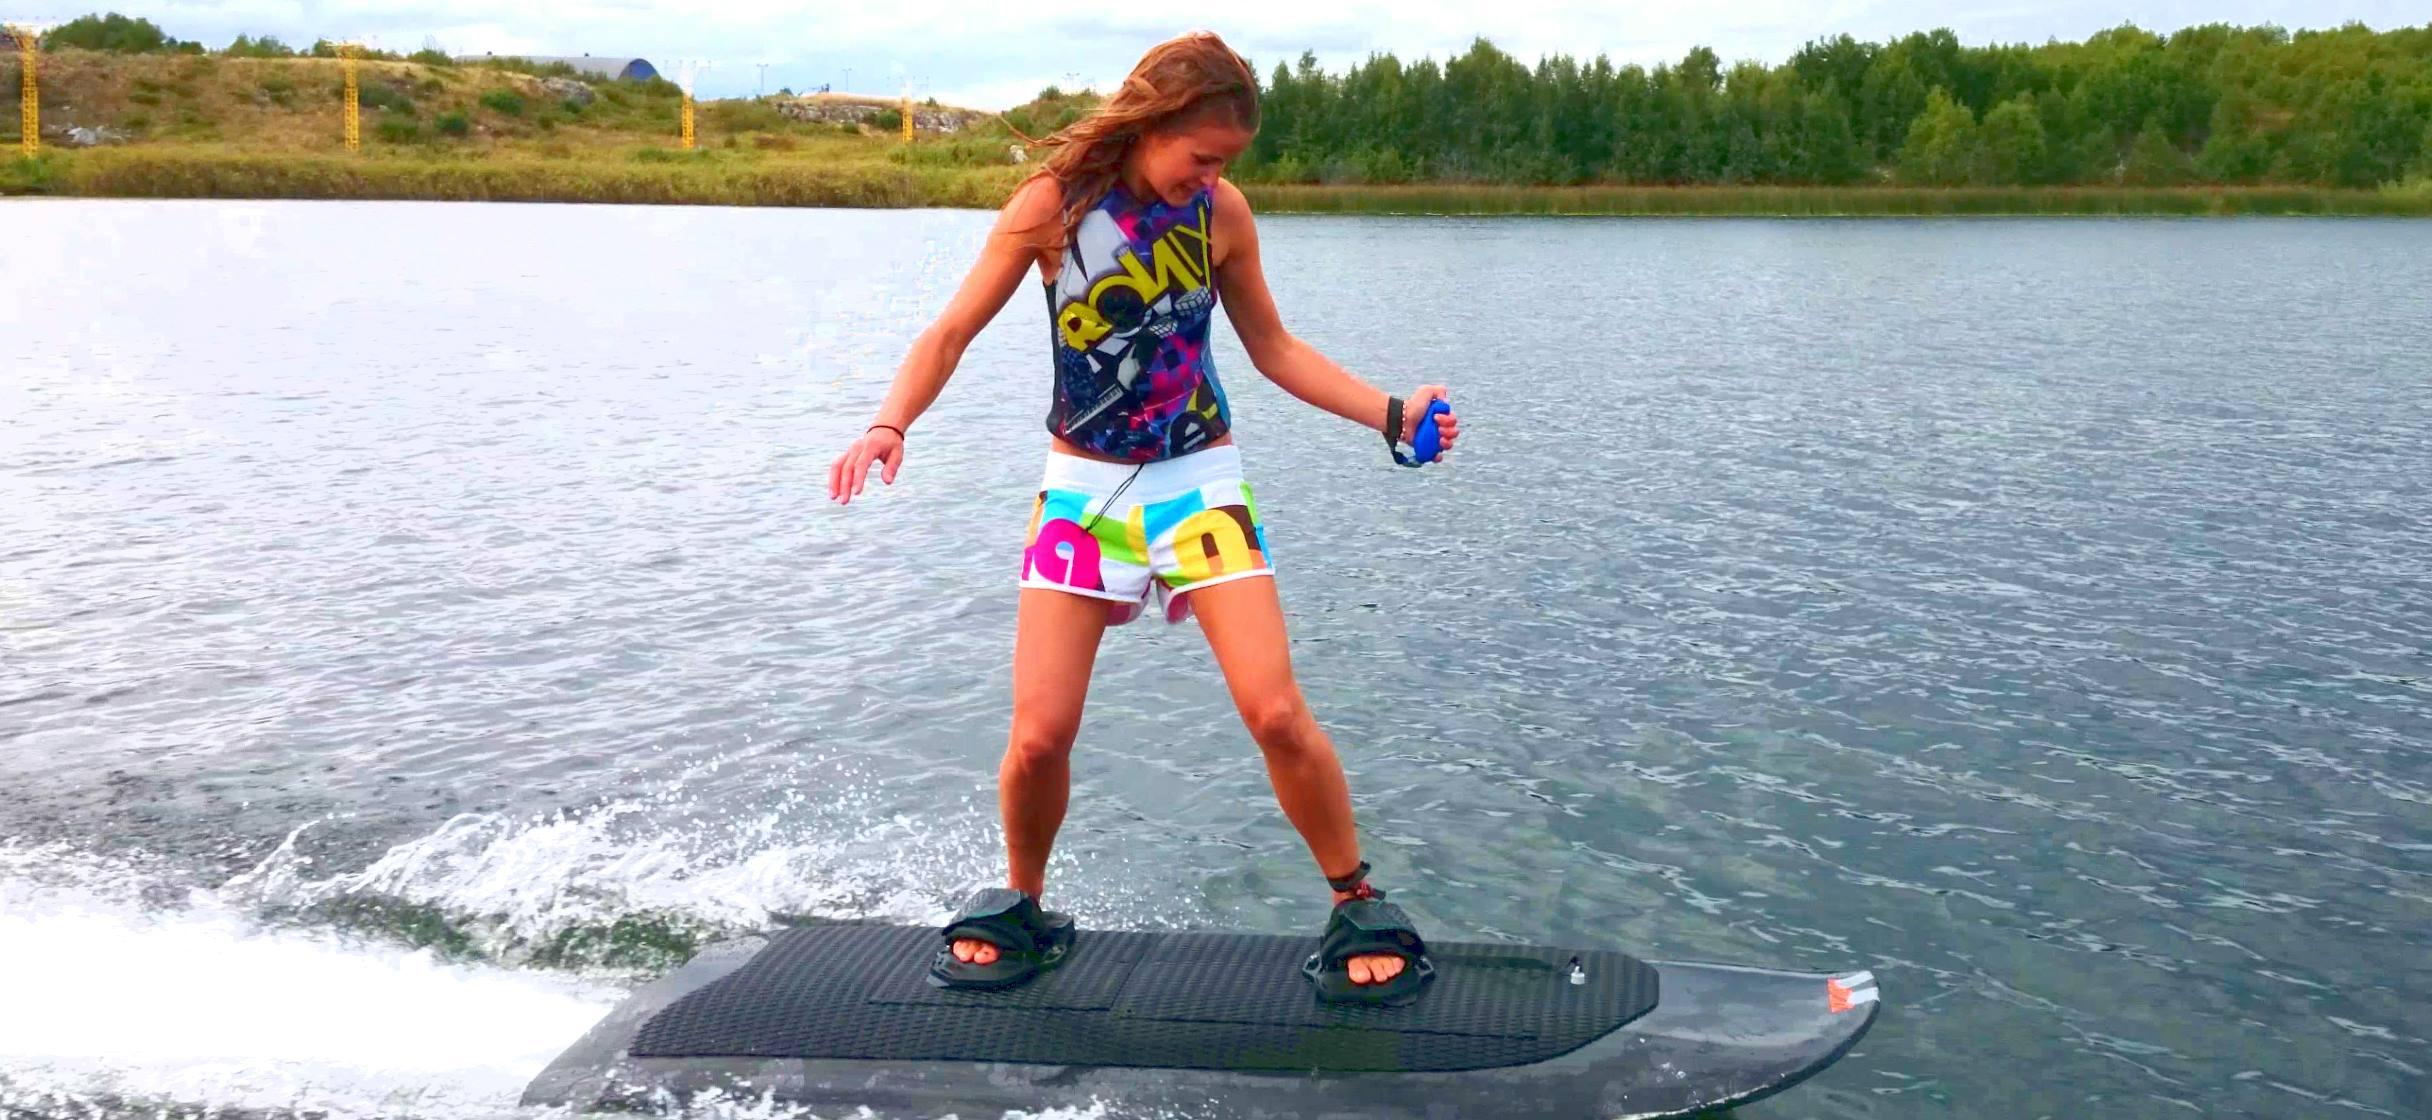 The Radinn Electric Powered le wakeboard de demain